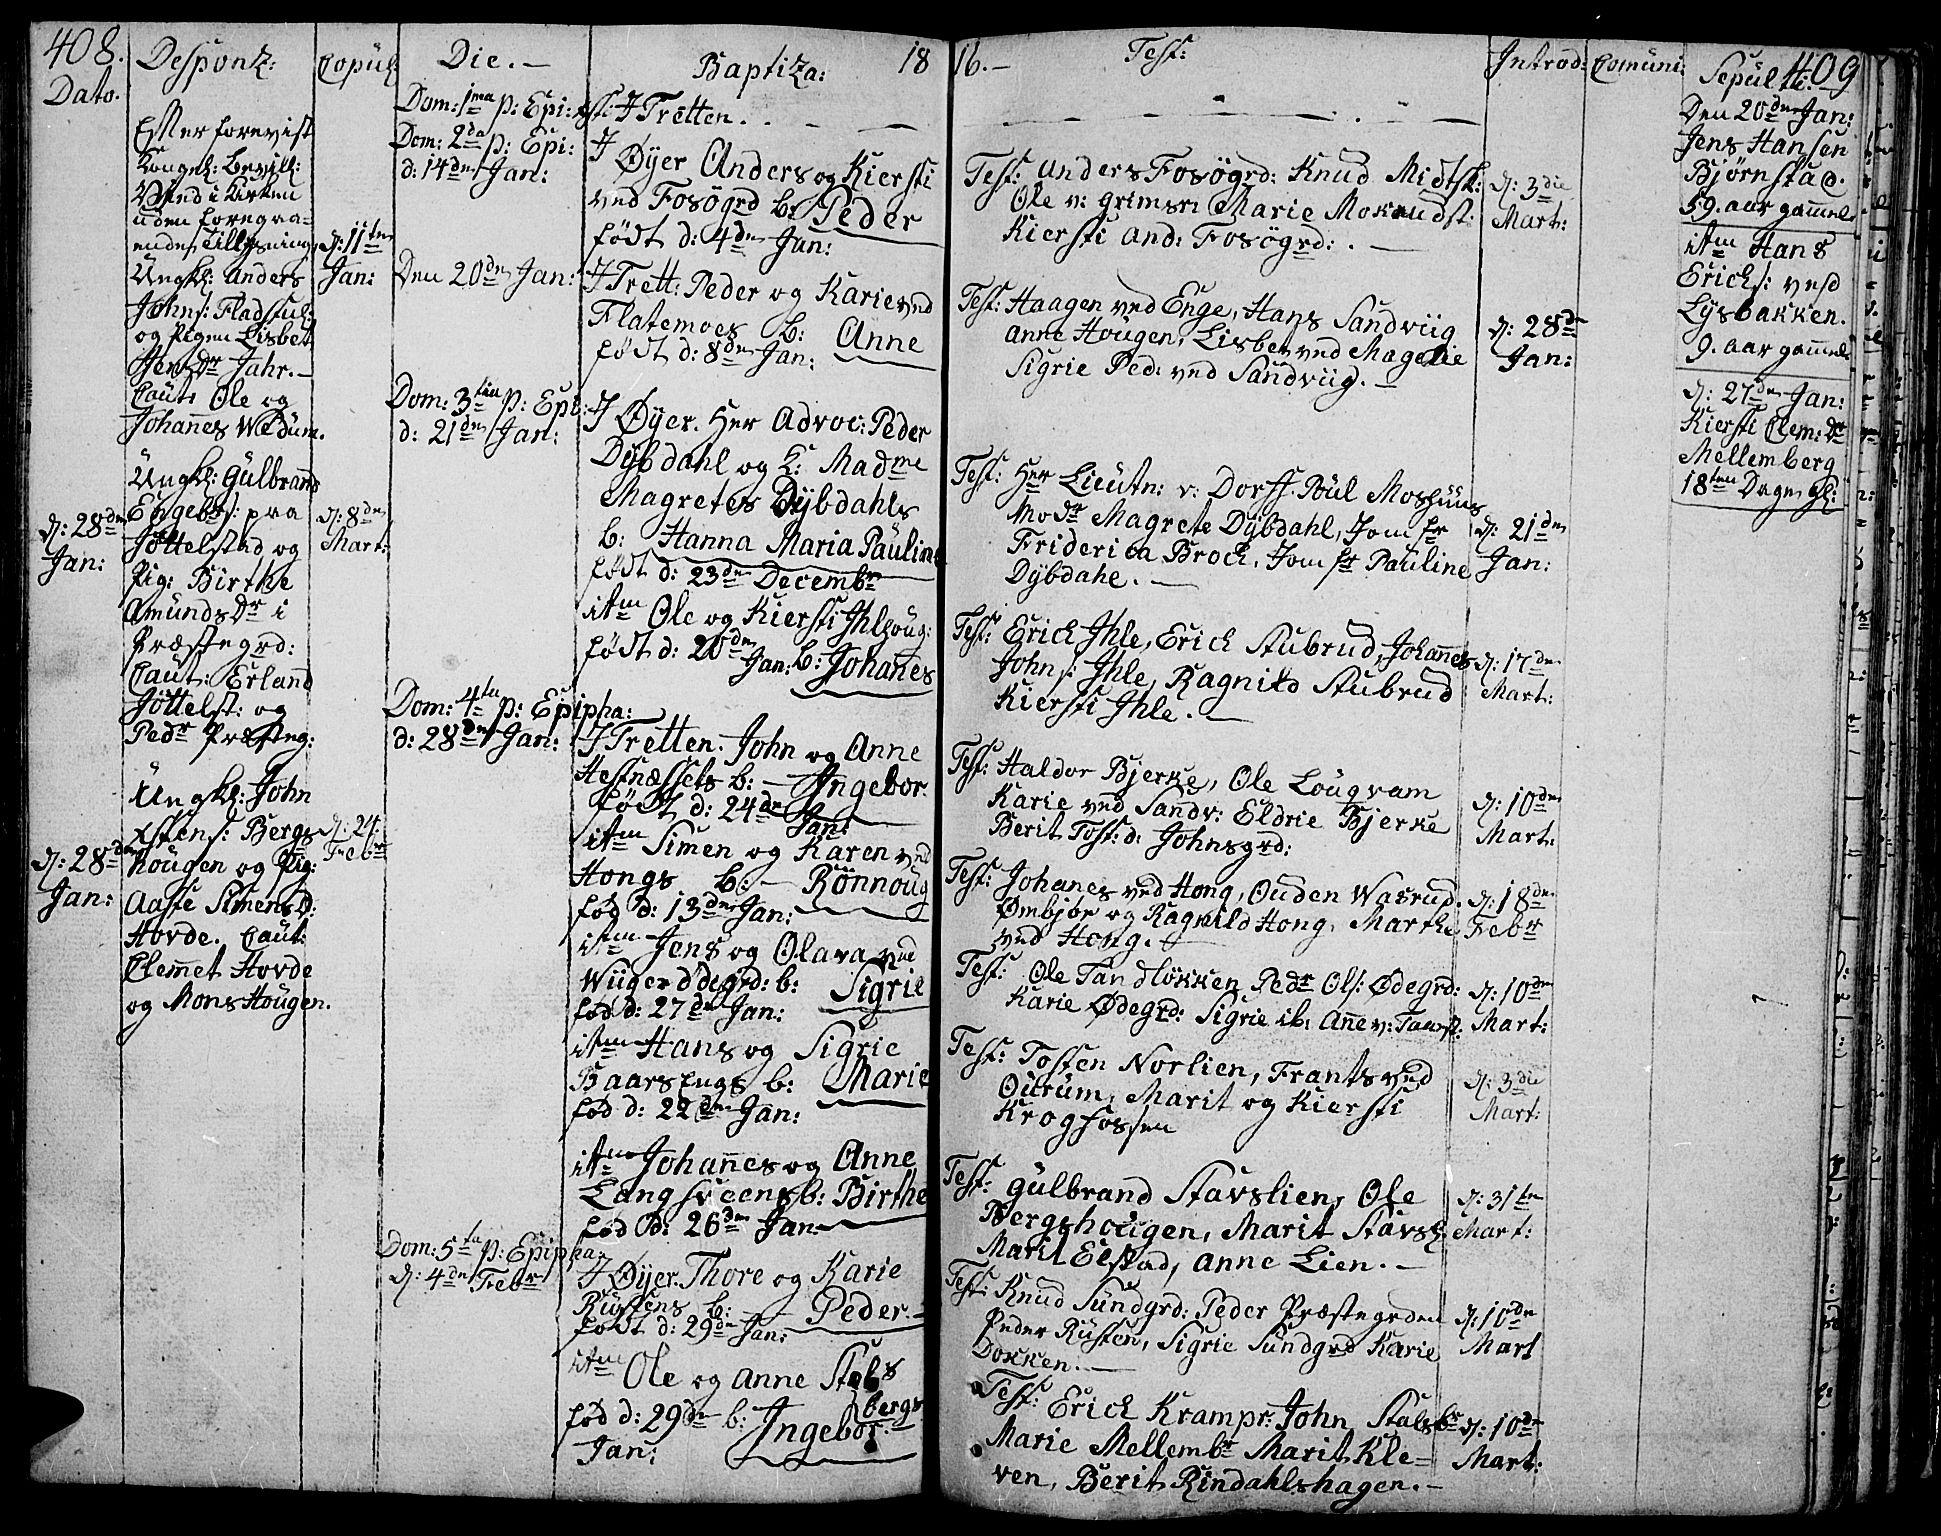 SAH, Øyer prestekontor, Ministerialbok nr. 3, 1784-1824, s. 408-409